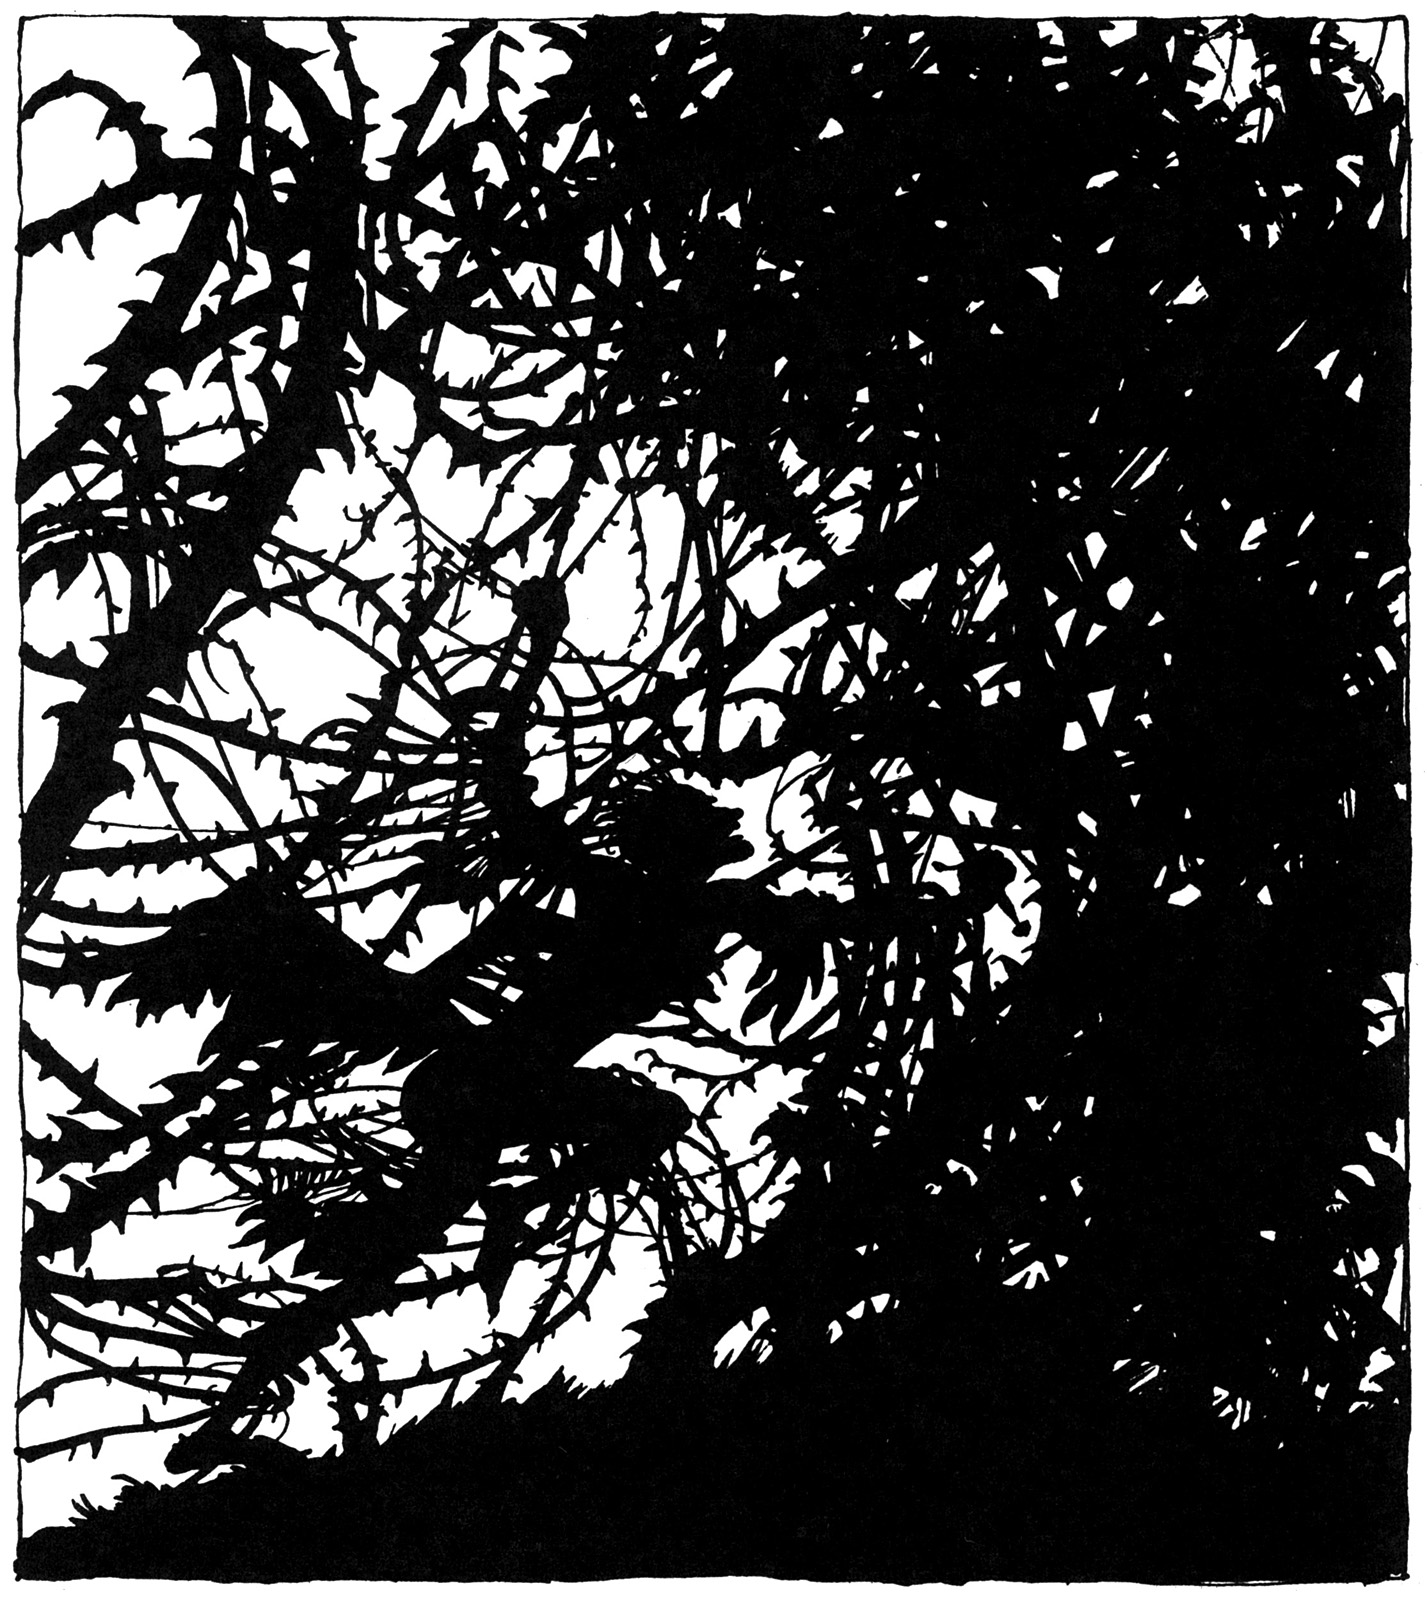 arthur rackham_the sleeping beauty_16